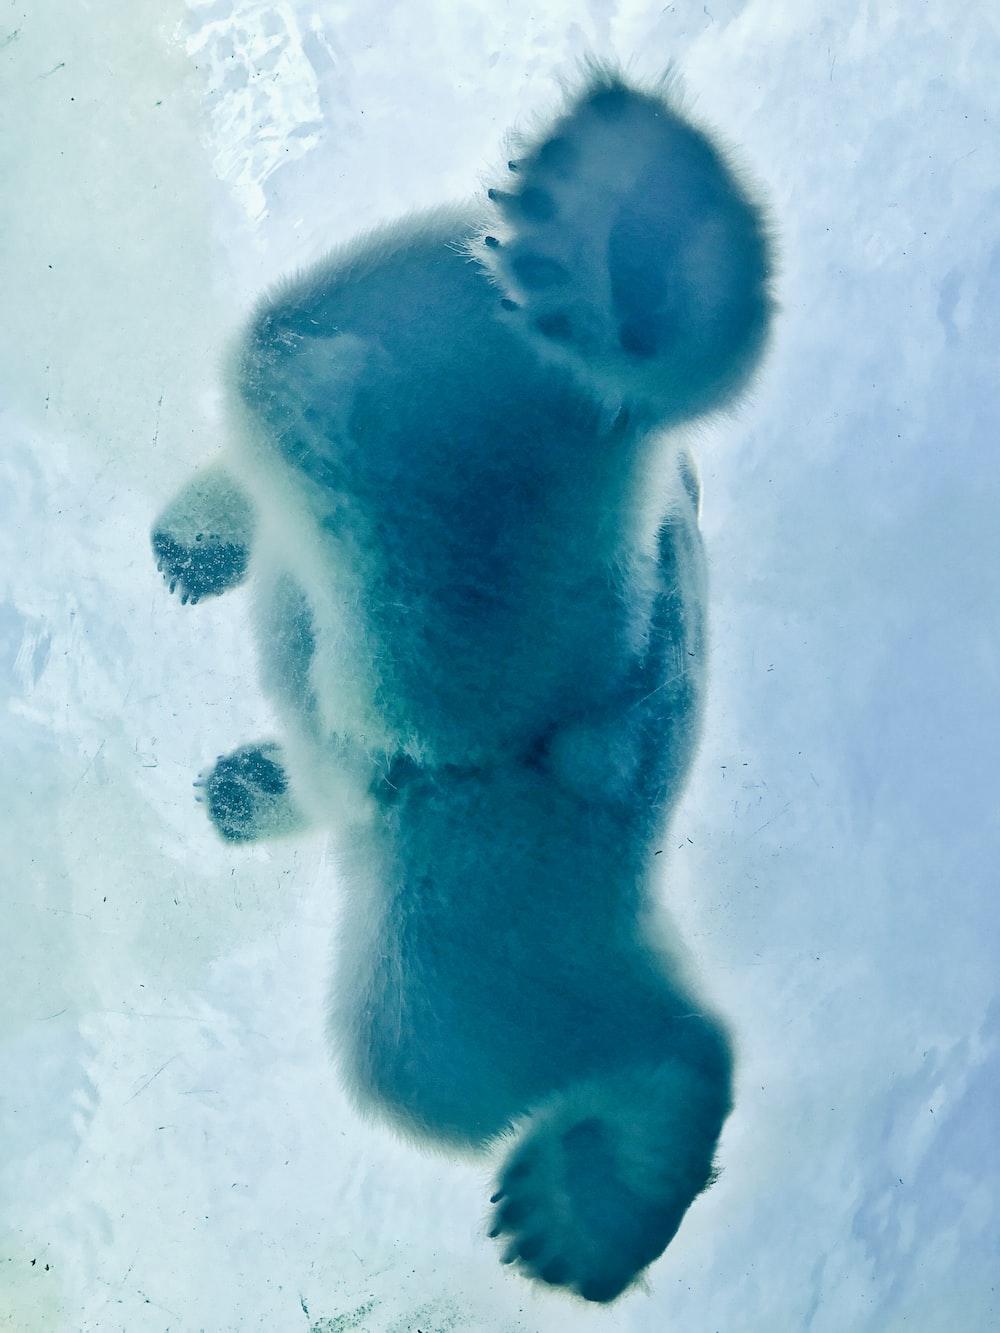 polar bear on body of water